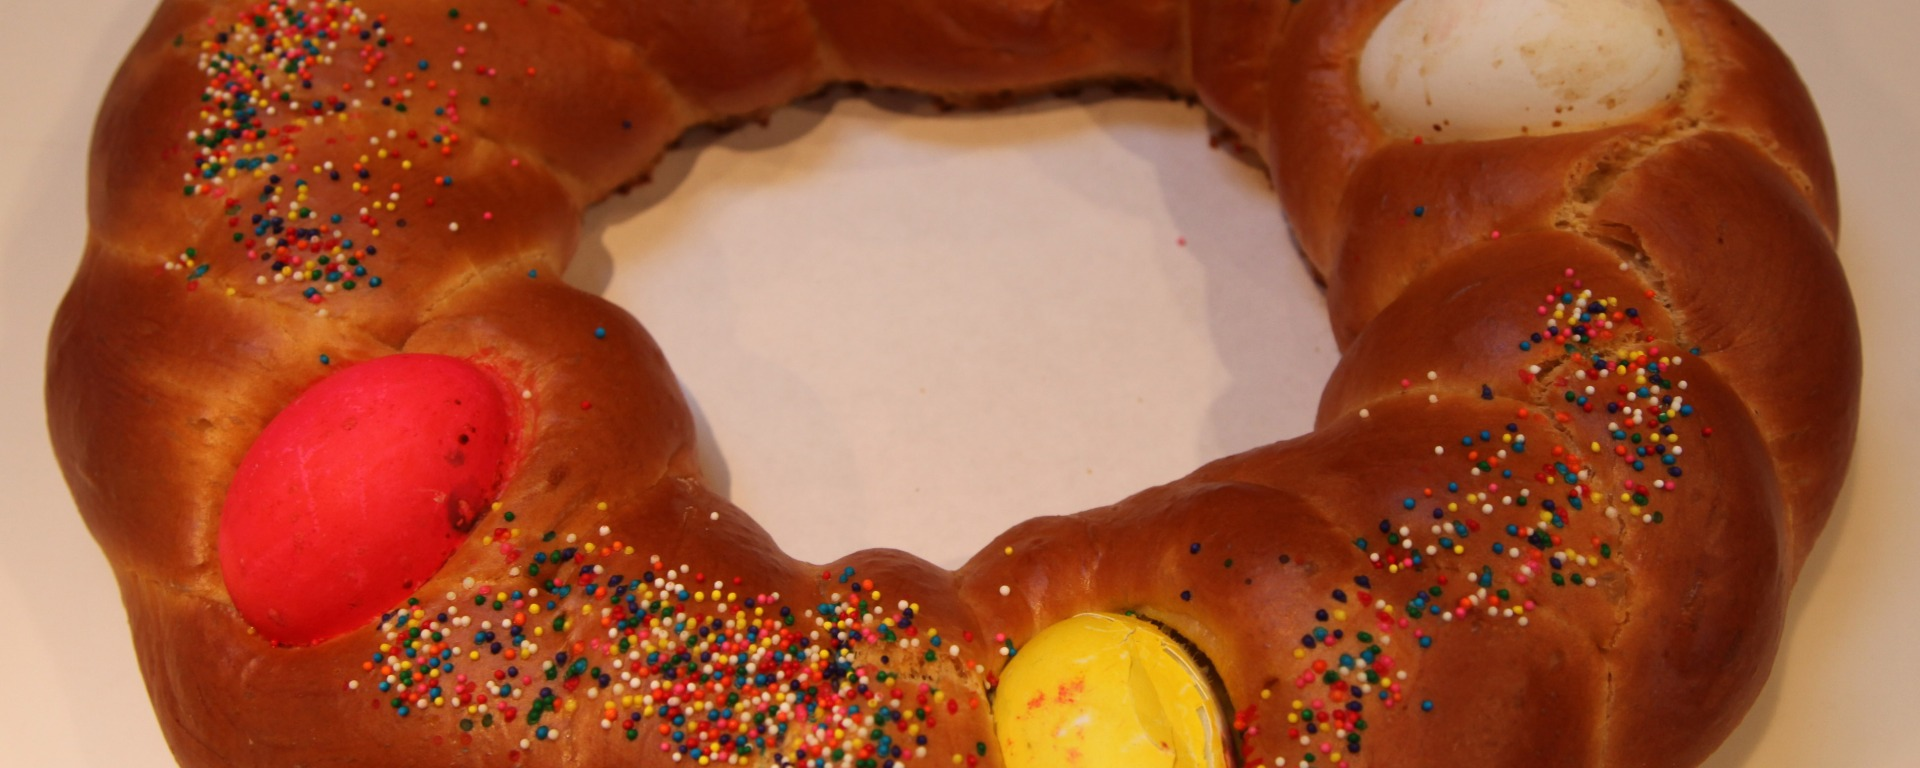 Tsoureki - Easter - Eggs - Bread - Between the Tines